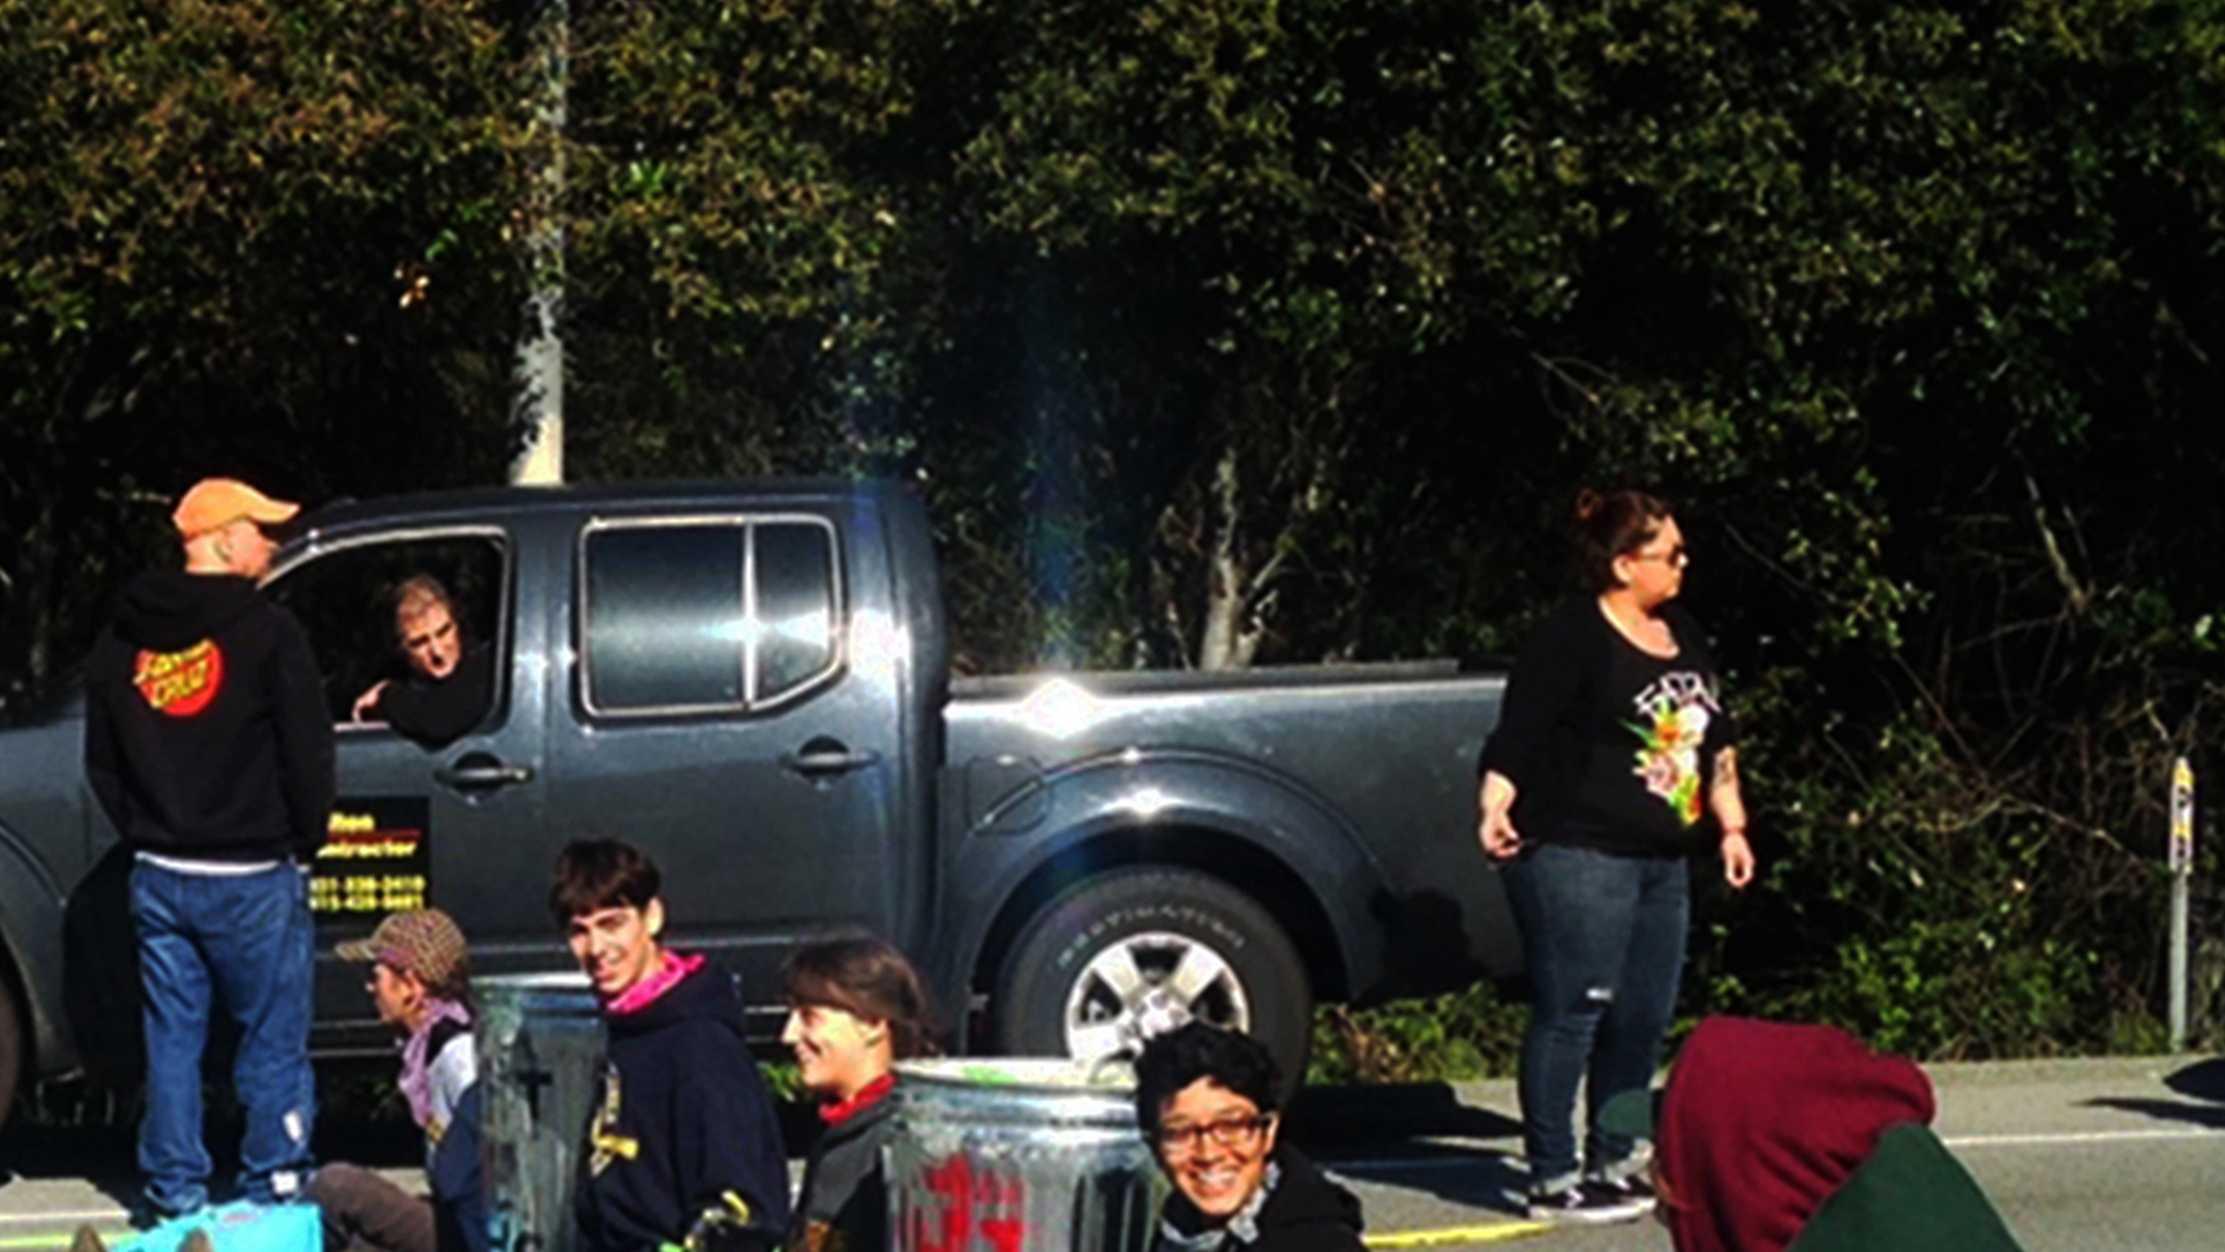 UC Santa Cruz students smile as they shut down Highway 1 with a human blockade.